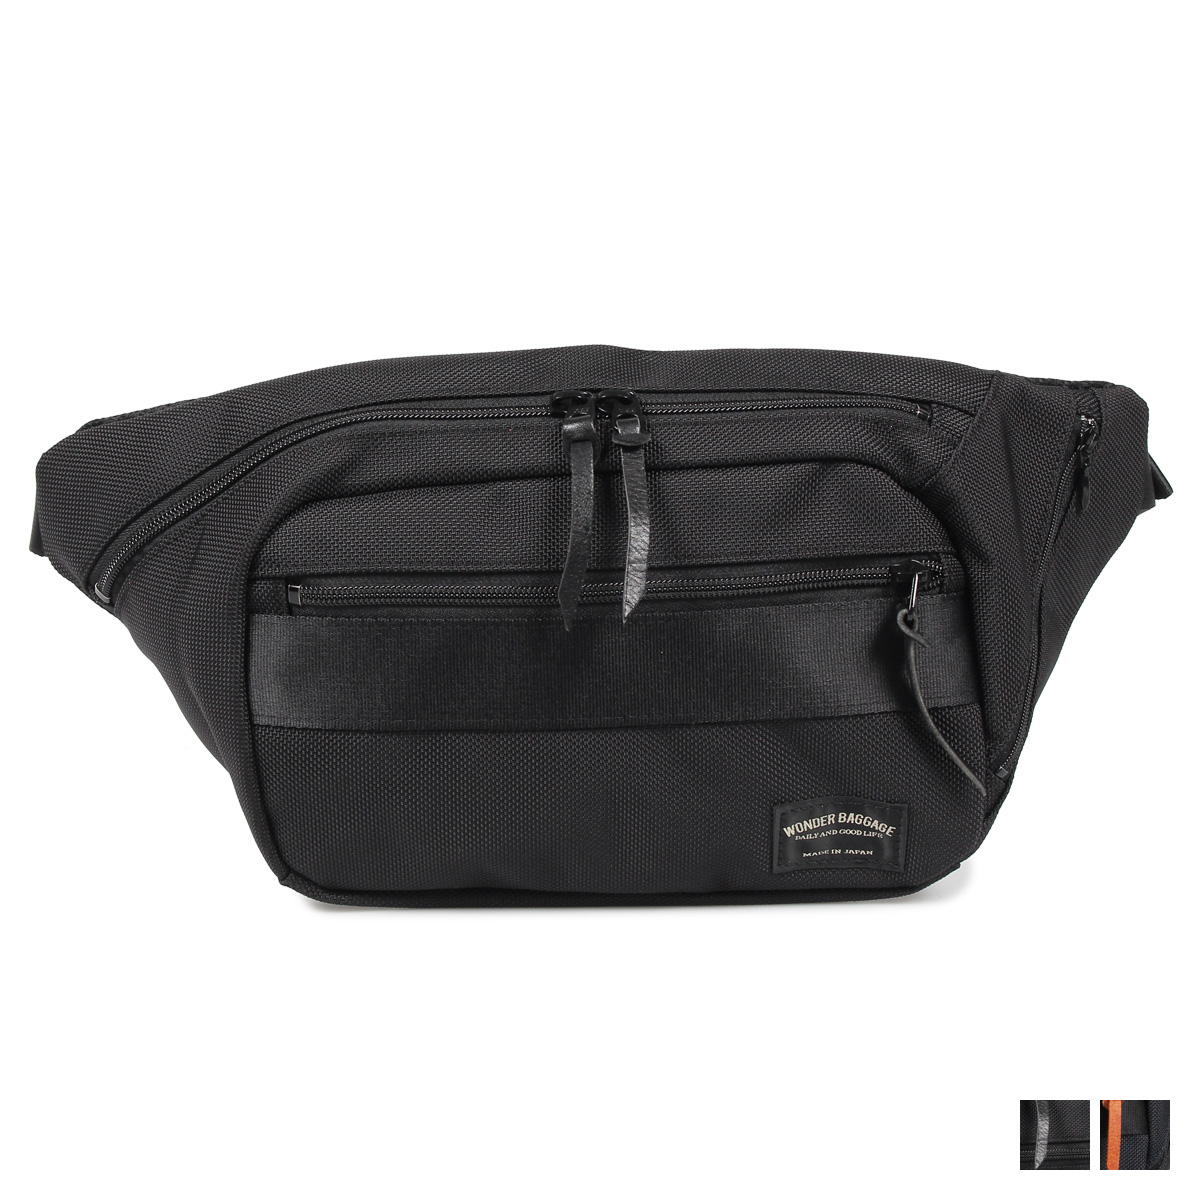 WONDER BAGGAGE GOODMANS WAIST BAG ワンダーバゲージ バッグ ボディバッグ ウエストバッグ グッドマンズ メンズ ブラック ネイビー 黒 WB-G-024